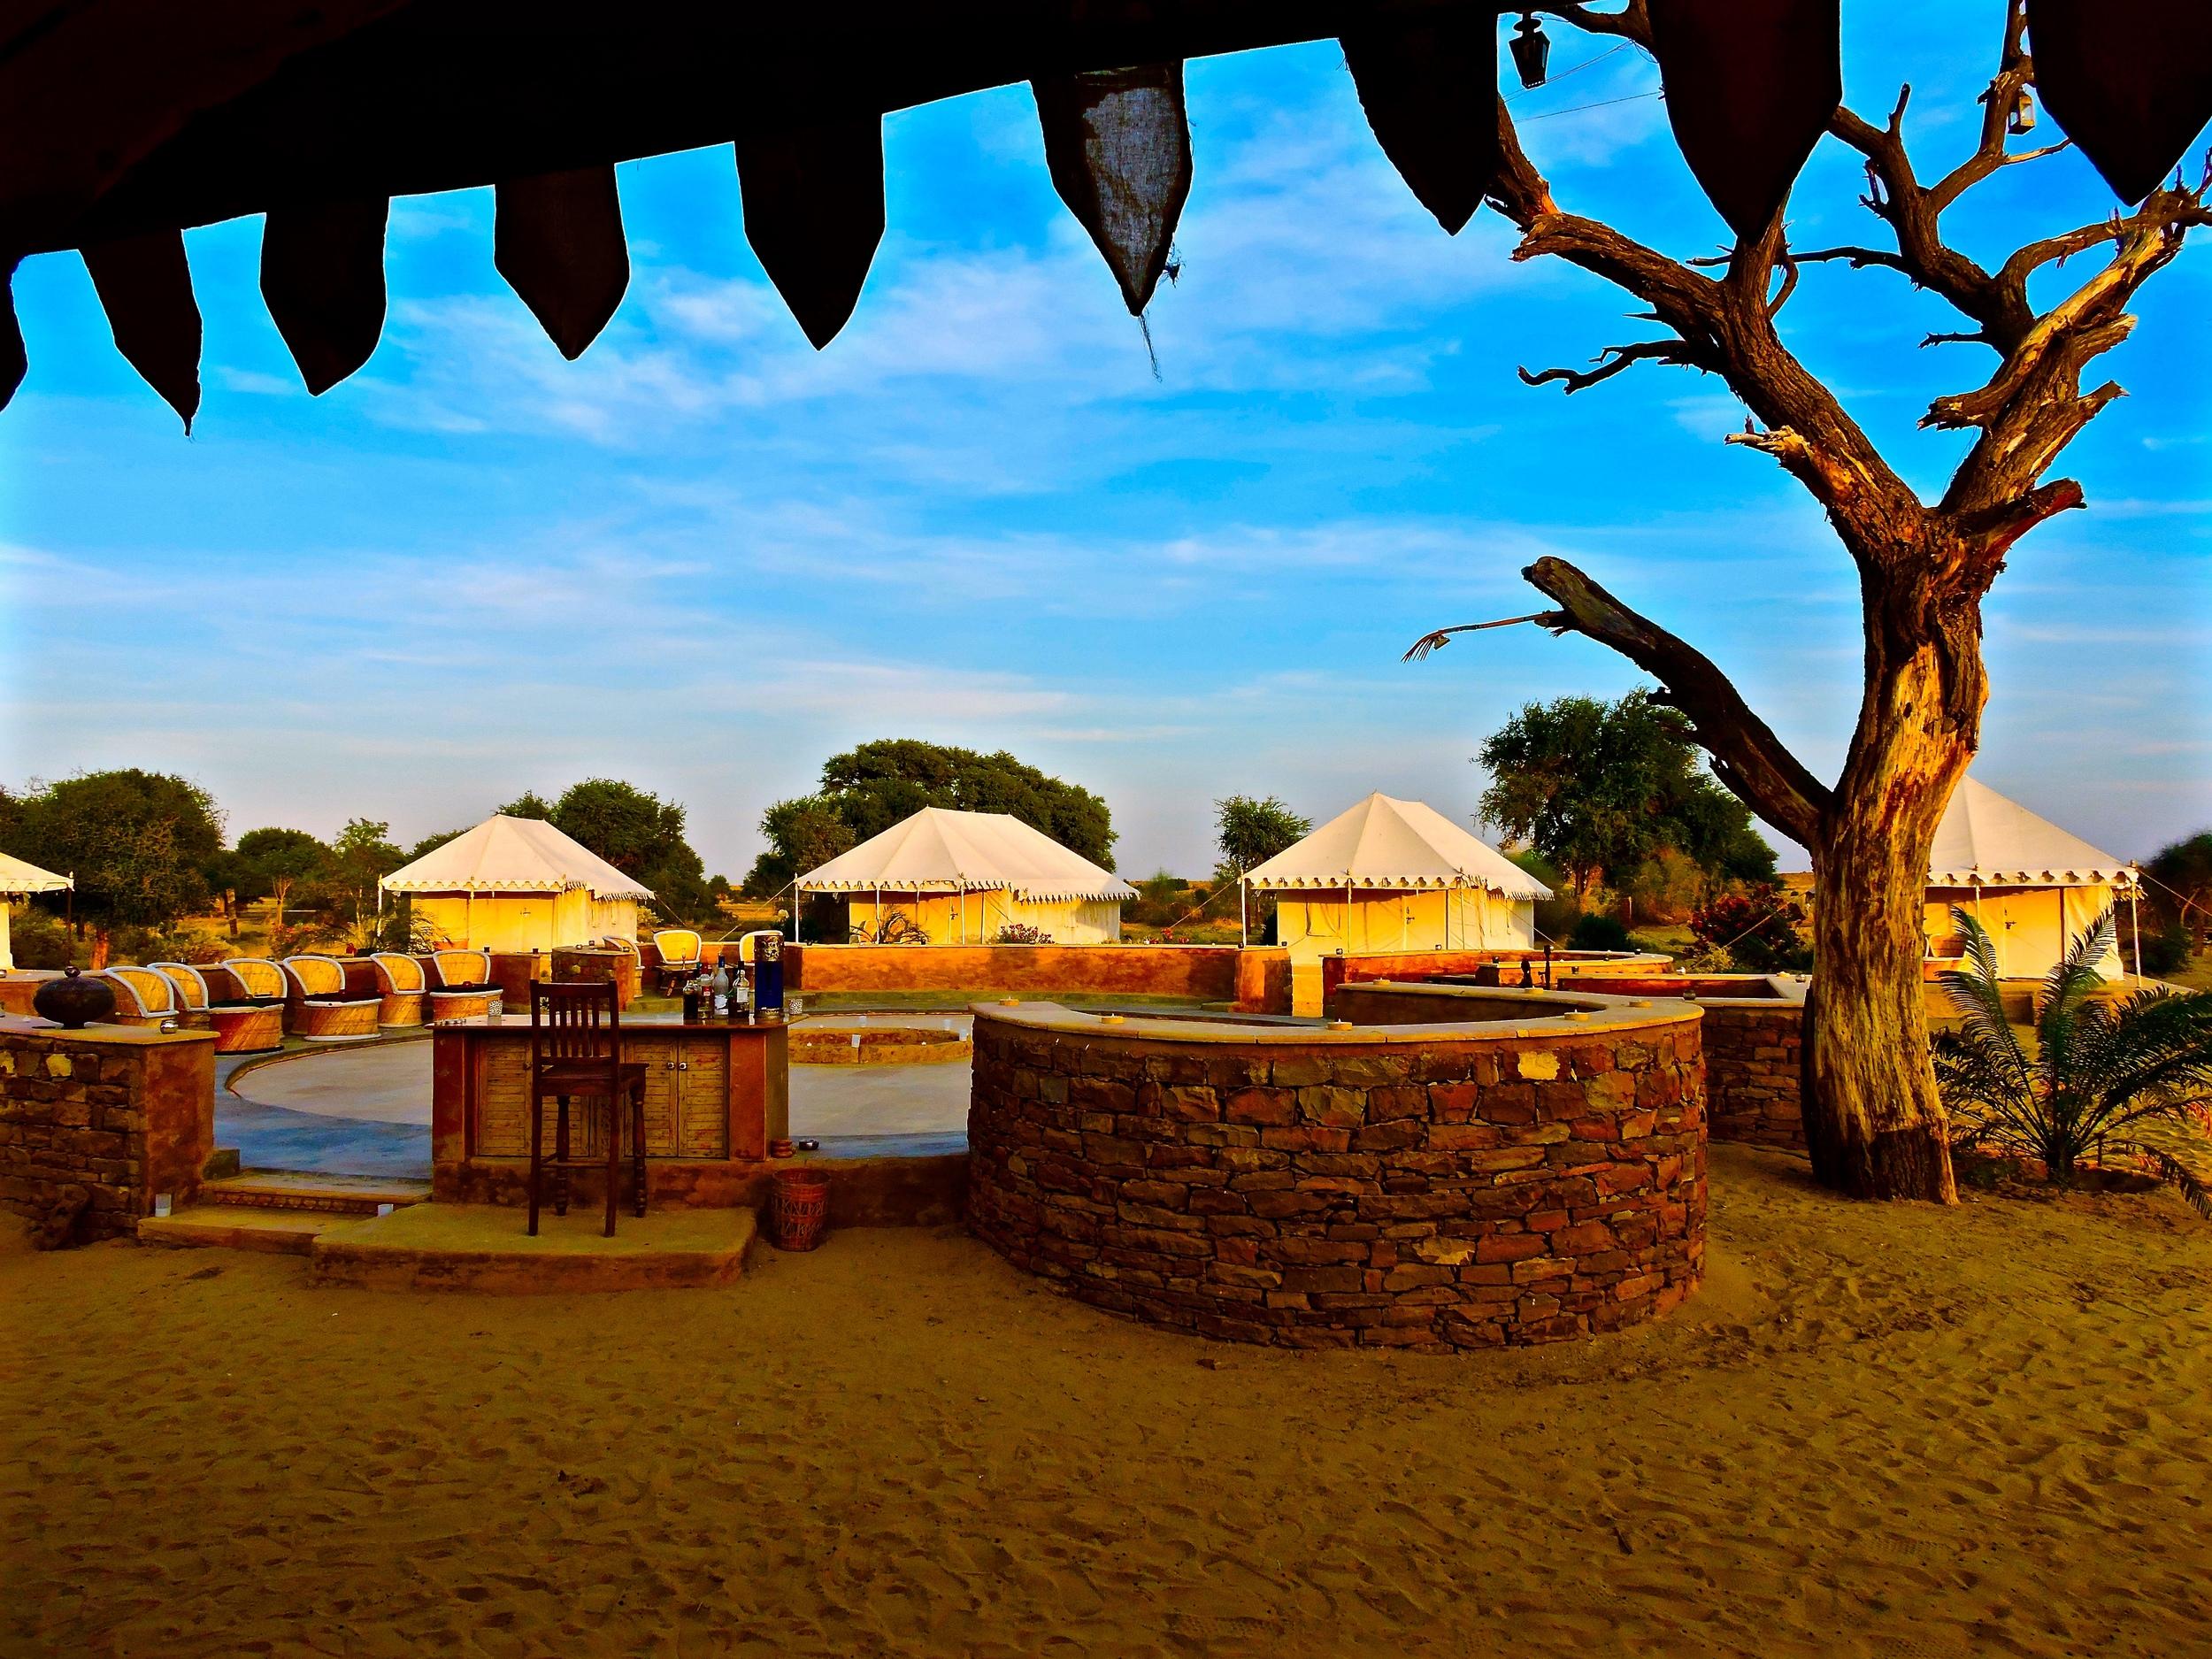 Damodara Desert Camp: Best Camping Sites in Jaisalmer